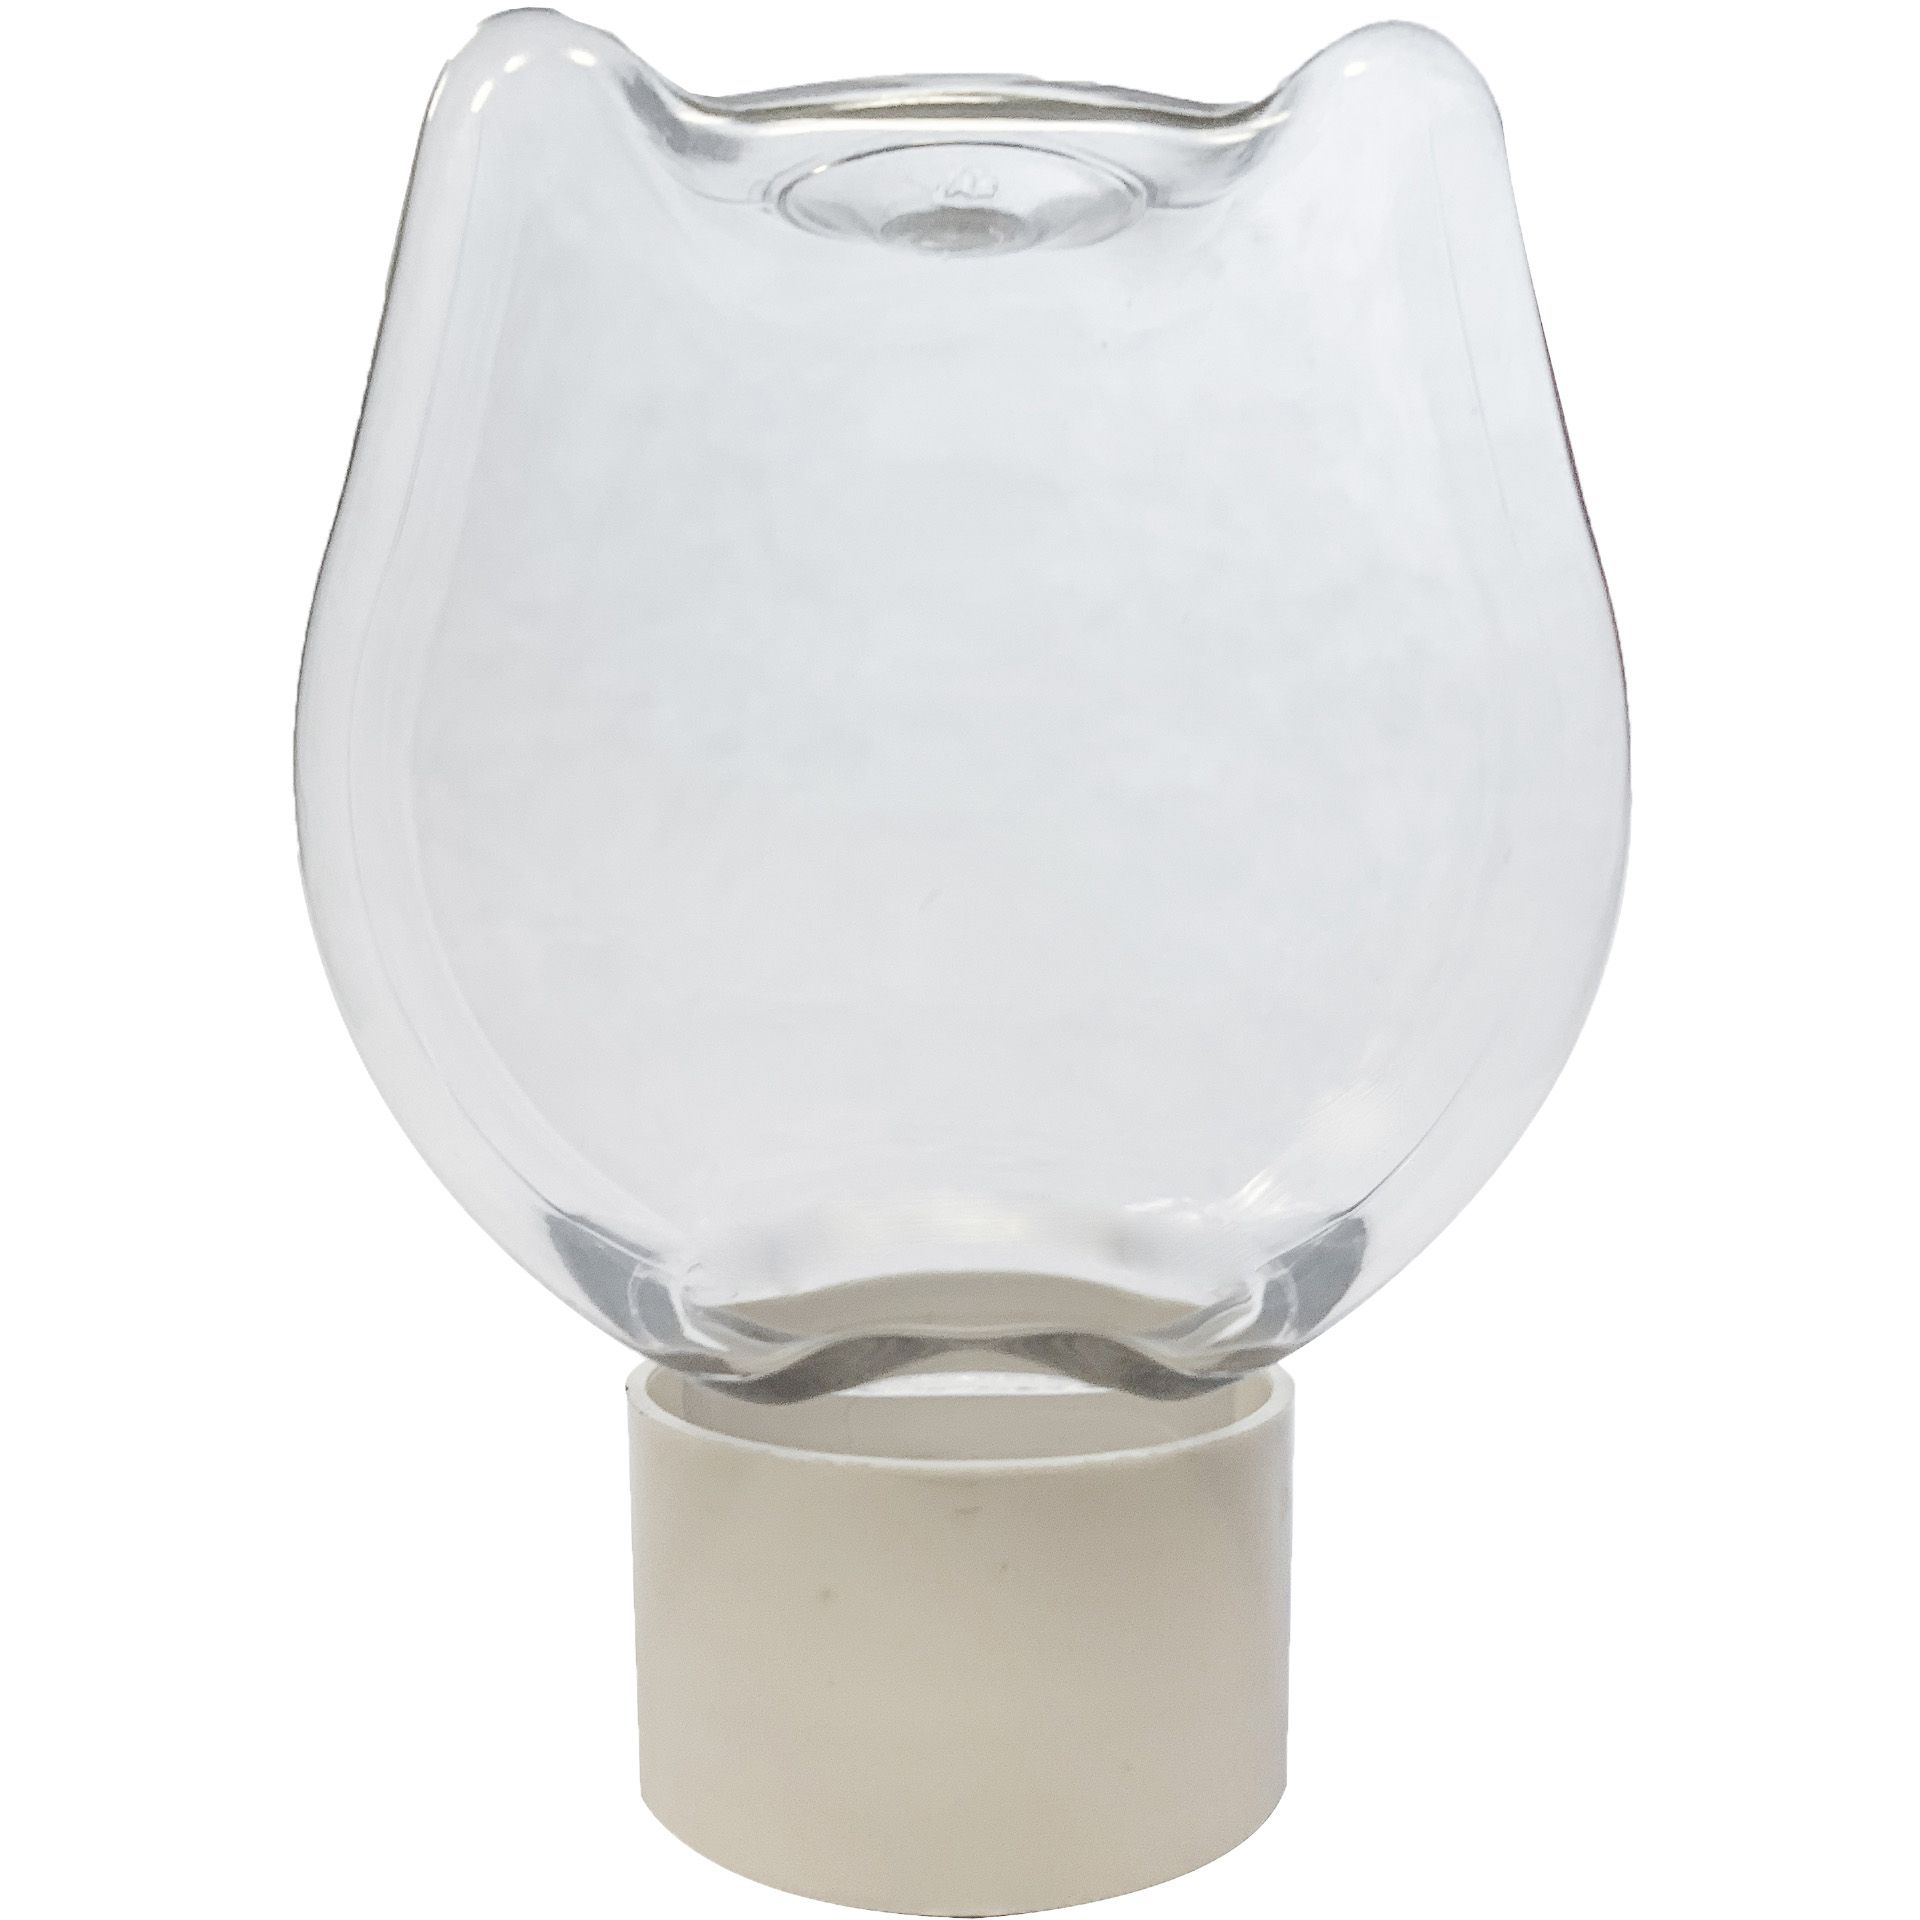 Tubete Mini baleiro para Lembrancinhas Orelha kit com 10 unid